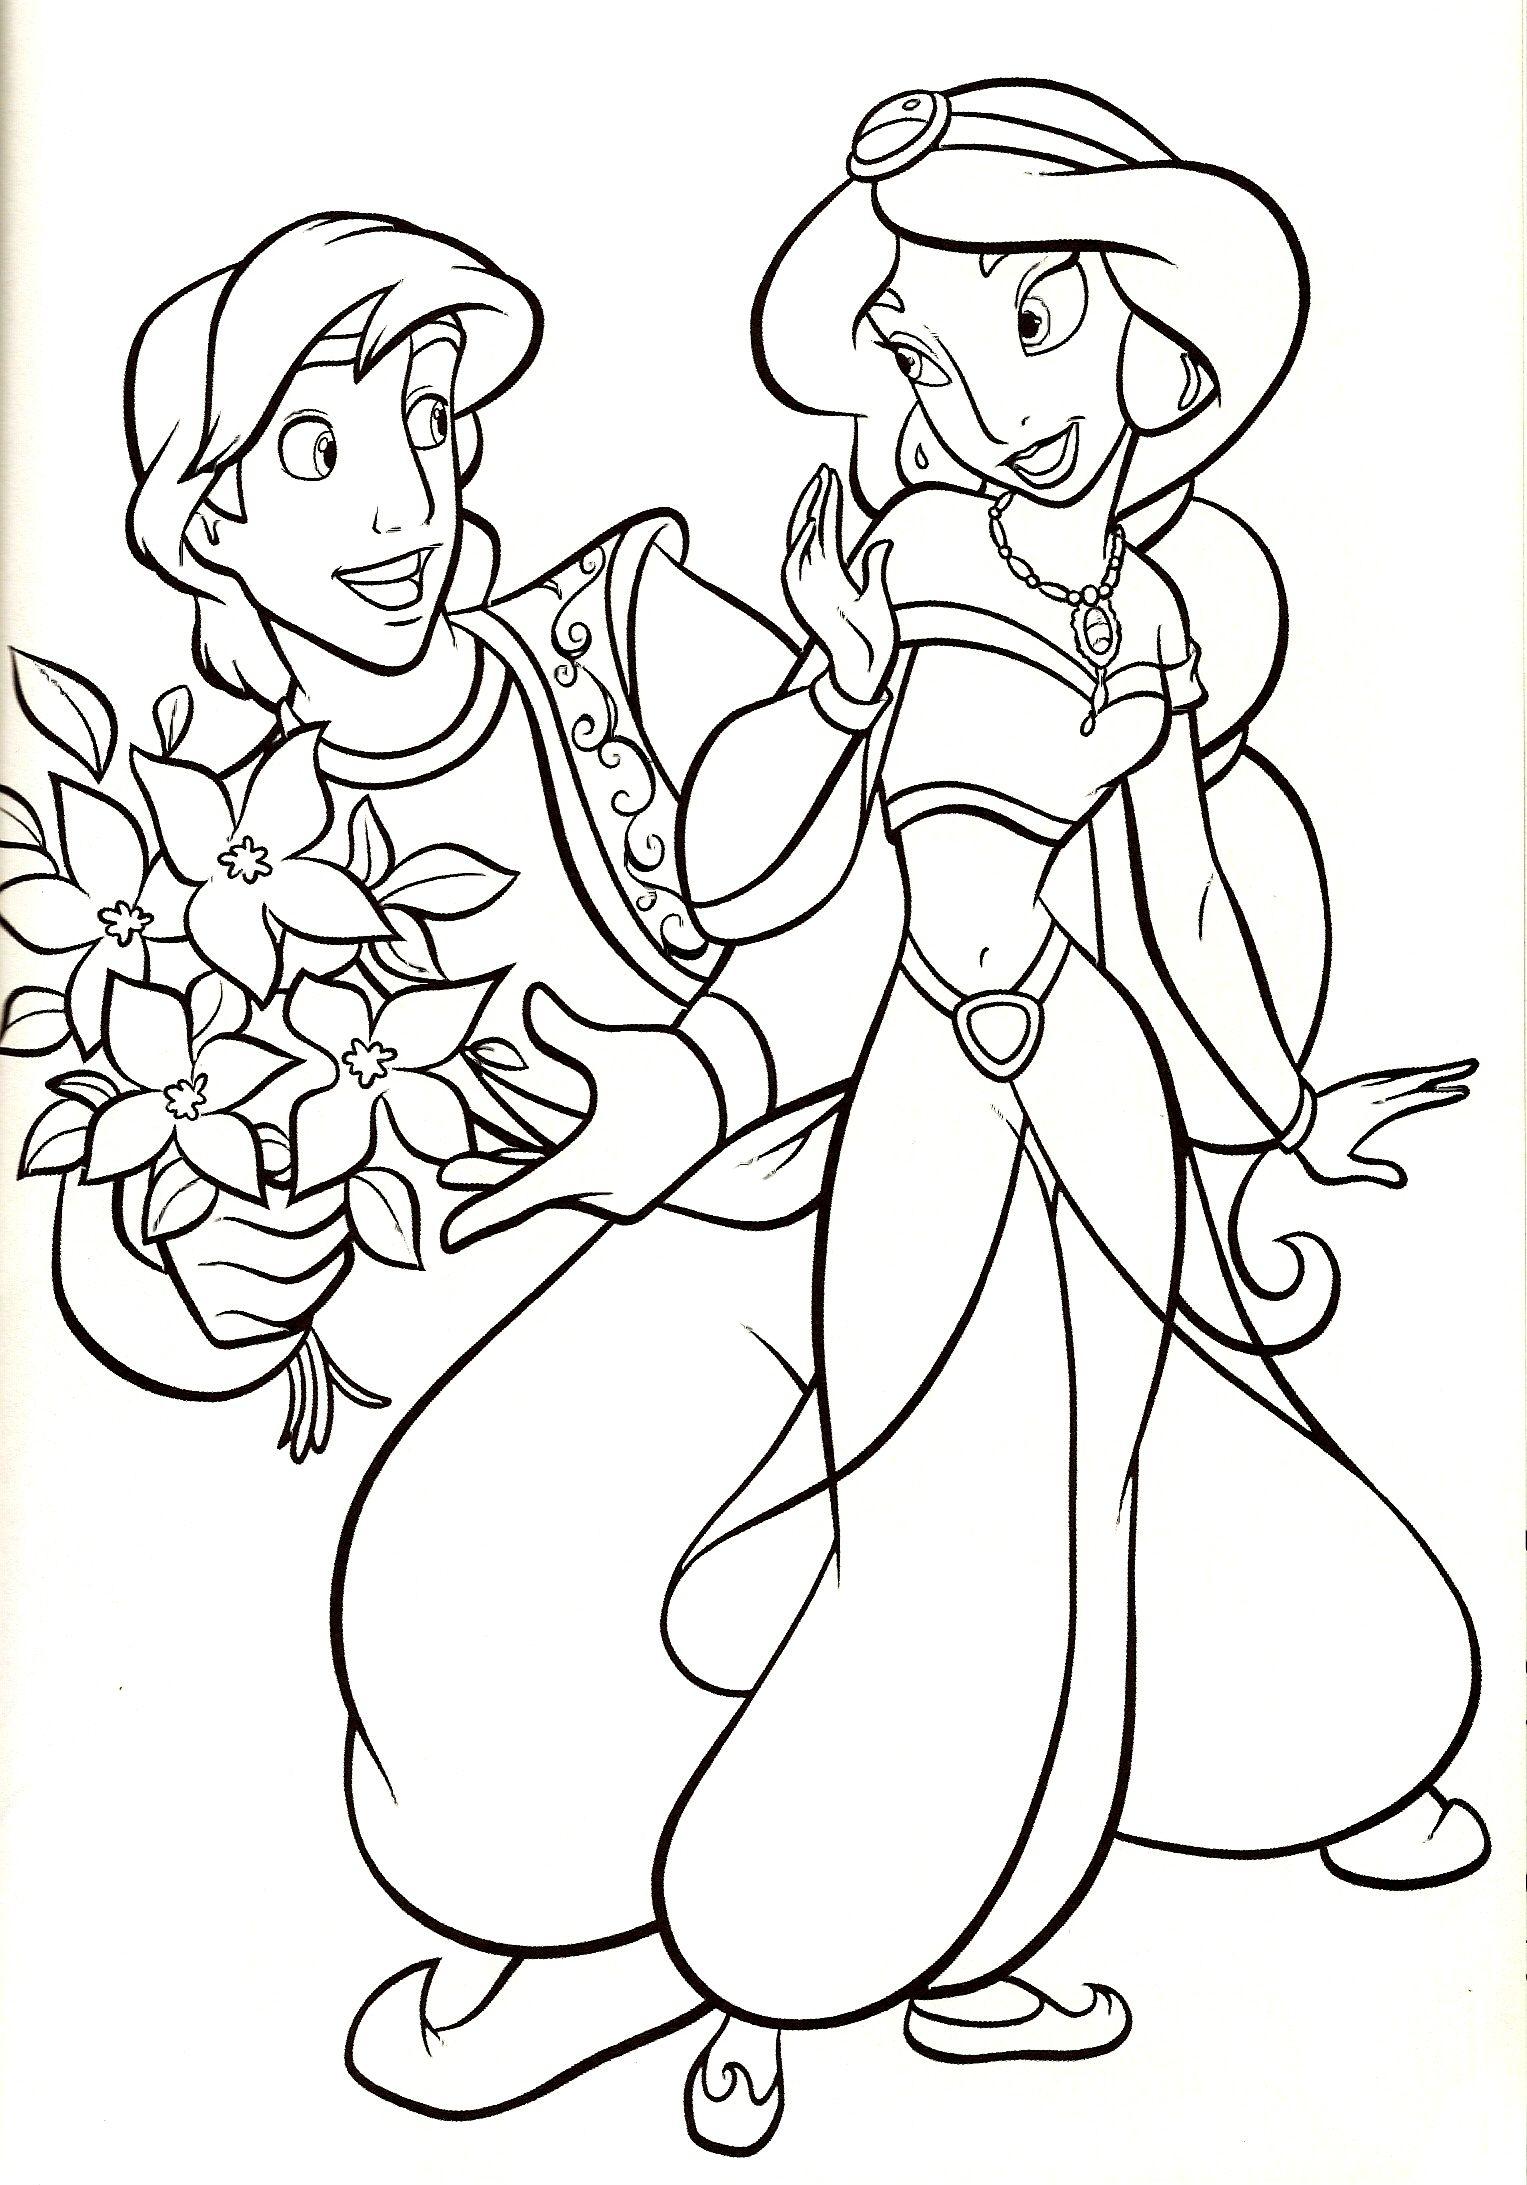 Живопись, раскраски с принцессой жасмин